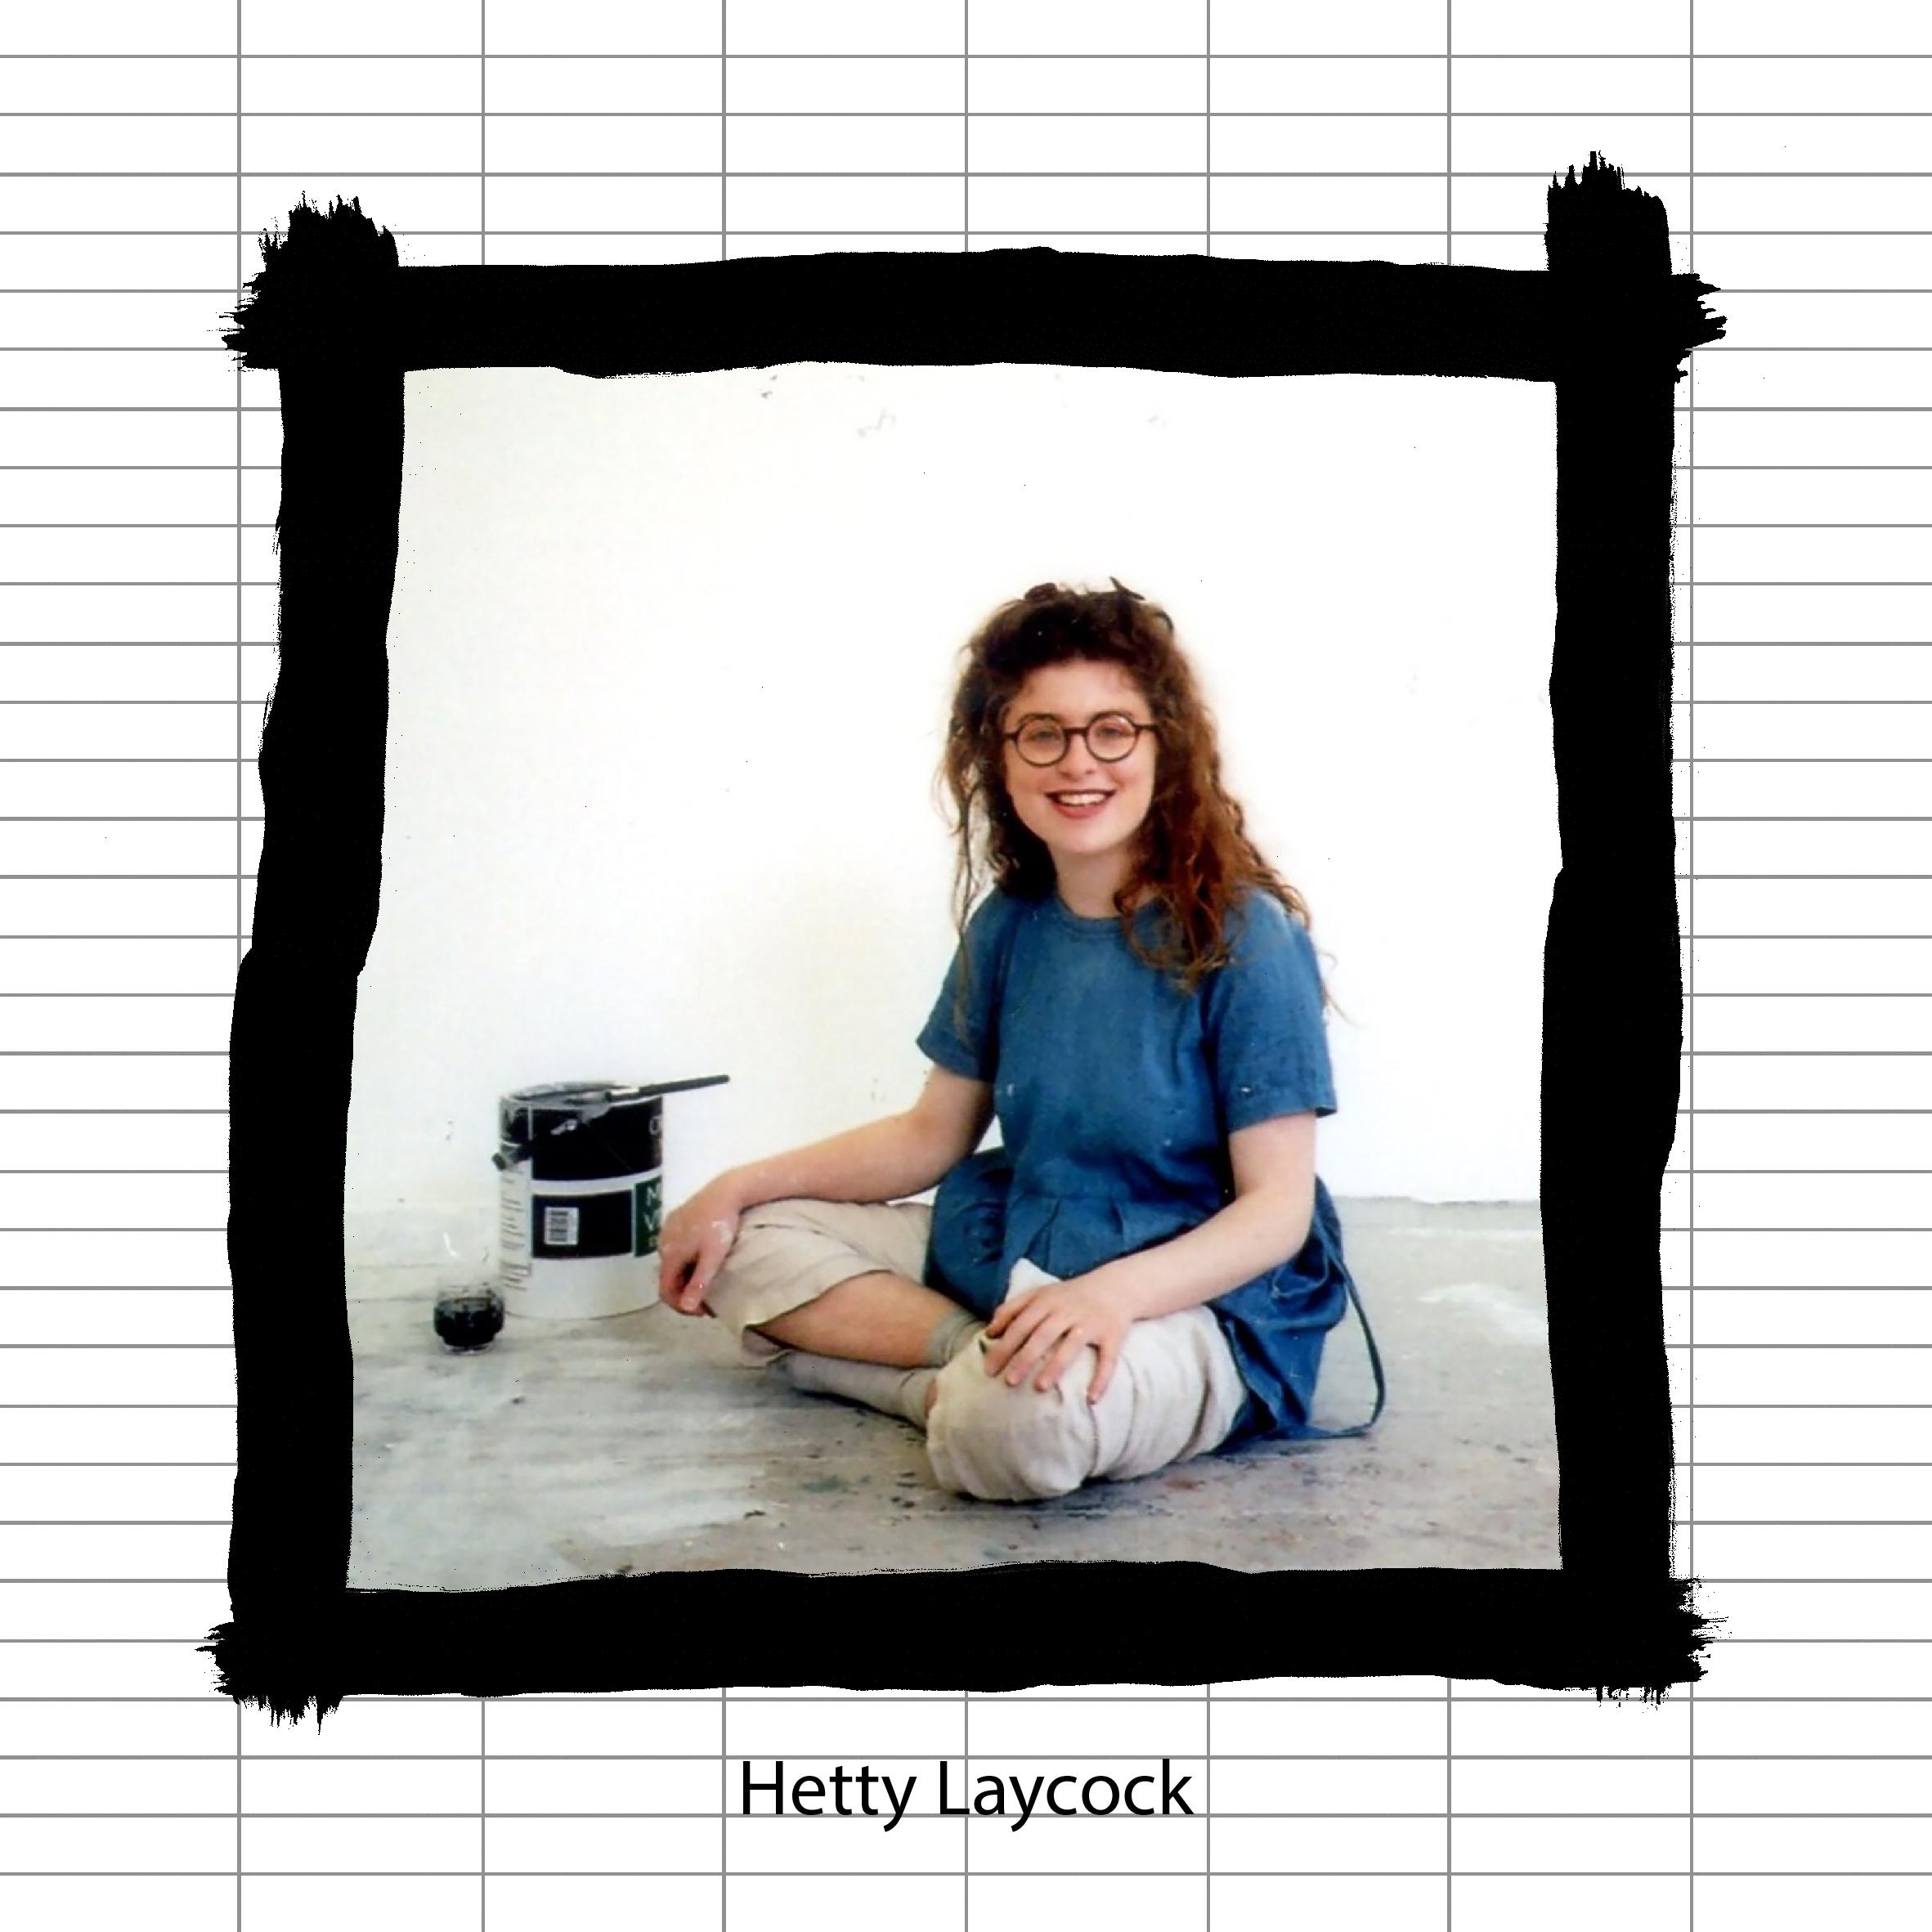 Hetty Laycock-01